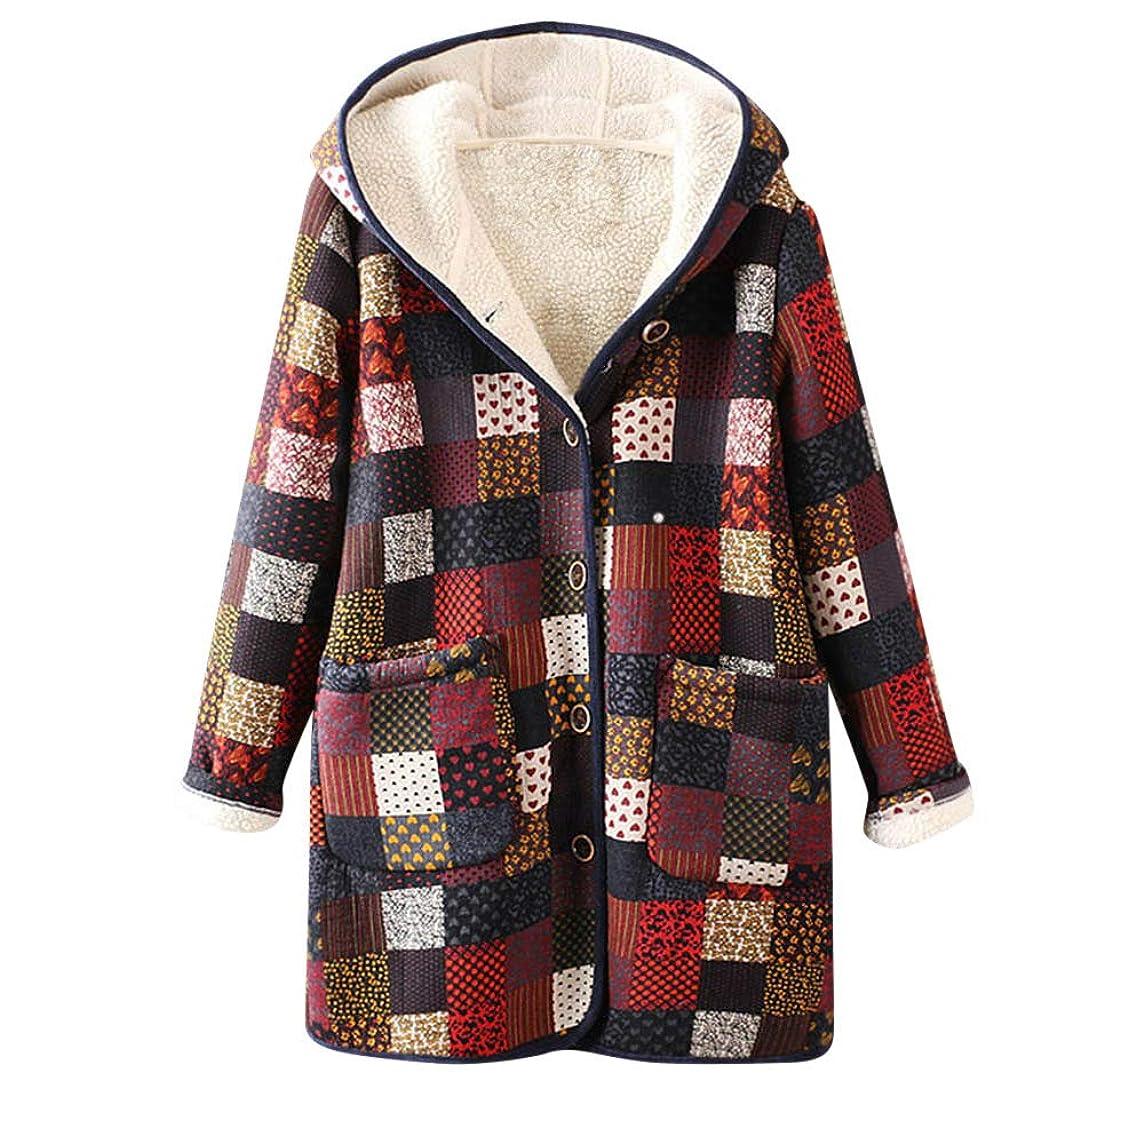 Warm Outwear Floral Print Hooded Pockets Vintage Oversize Coat Women